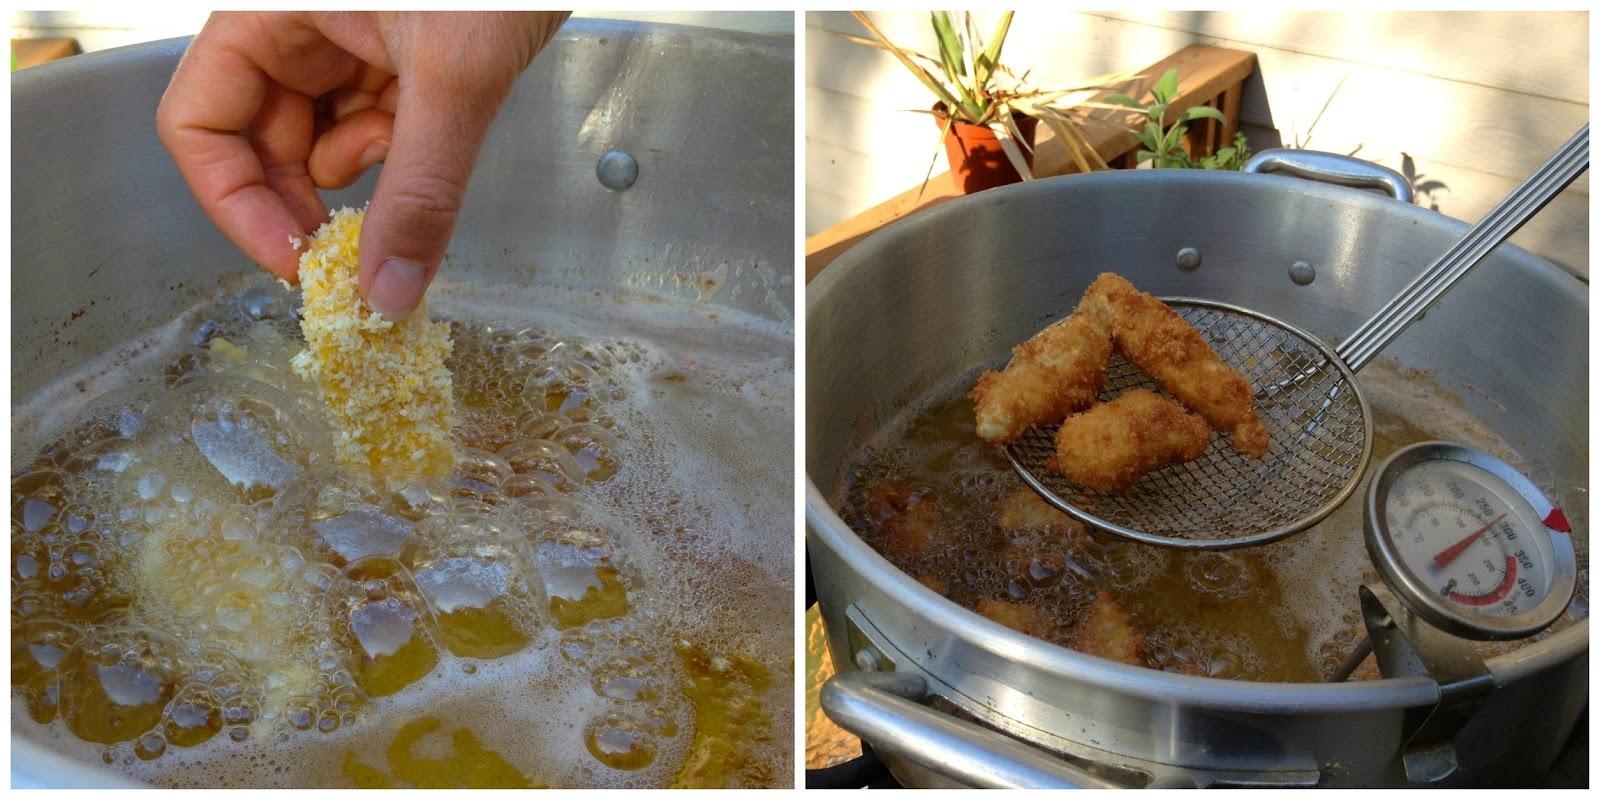 The baked alaska project deep fried alaska halibut cheeks for Best oil for deep frying fish